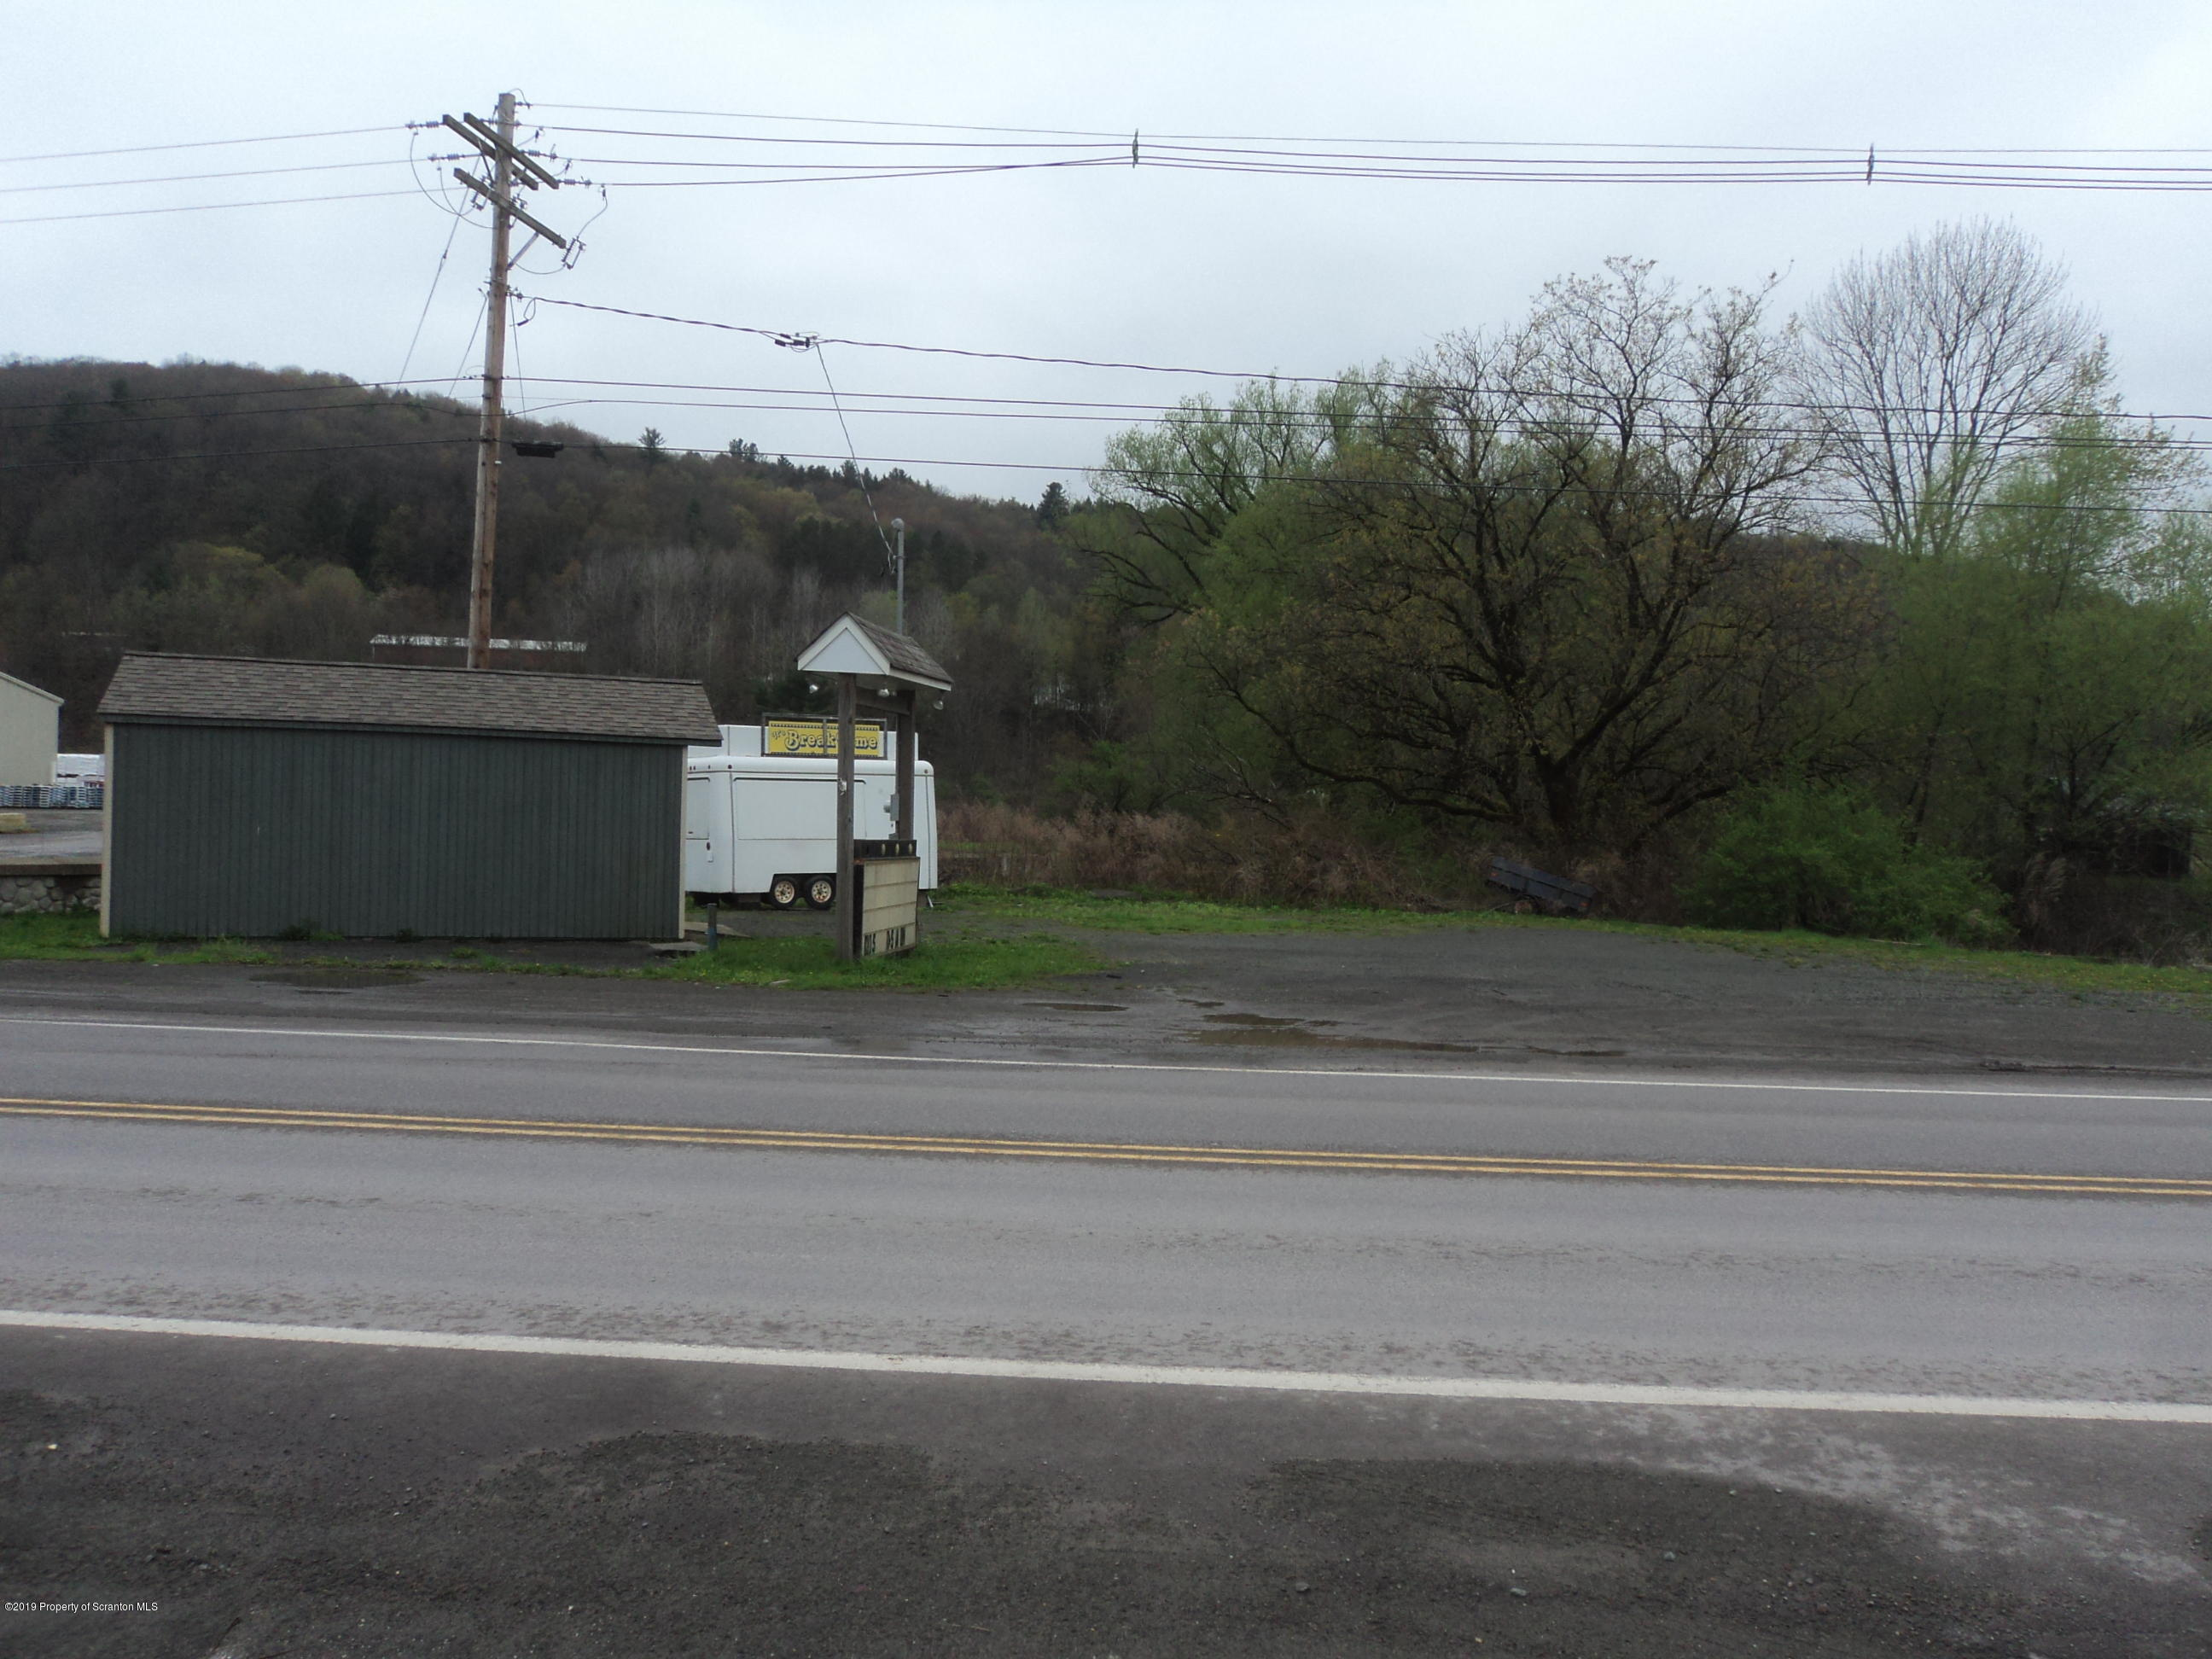 000 SR 11, New Milford, Pennsylvania 18834, ,Land,For Sale,SR 11,19-2099